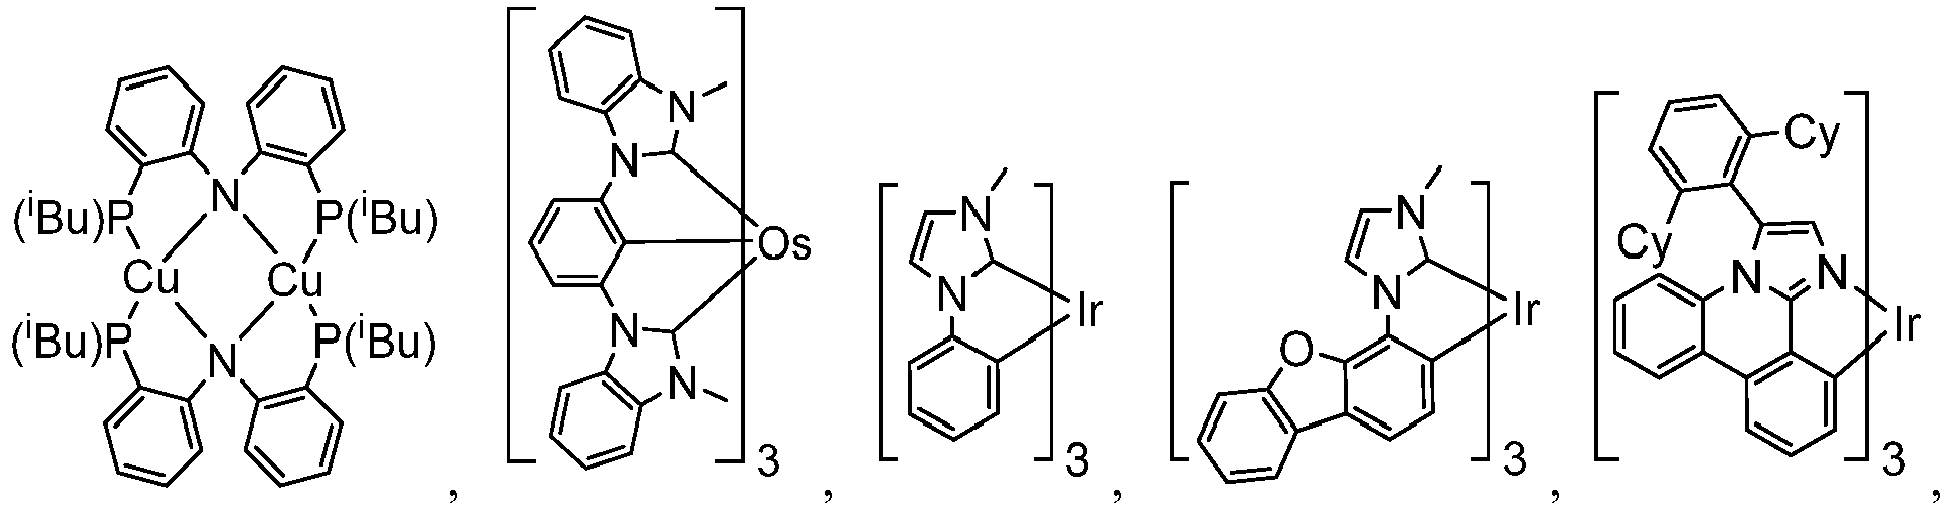 Figure imgb0916